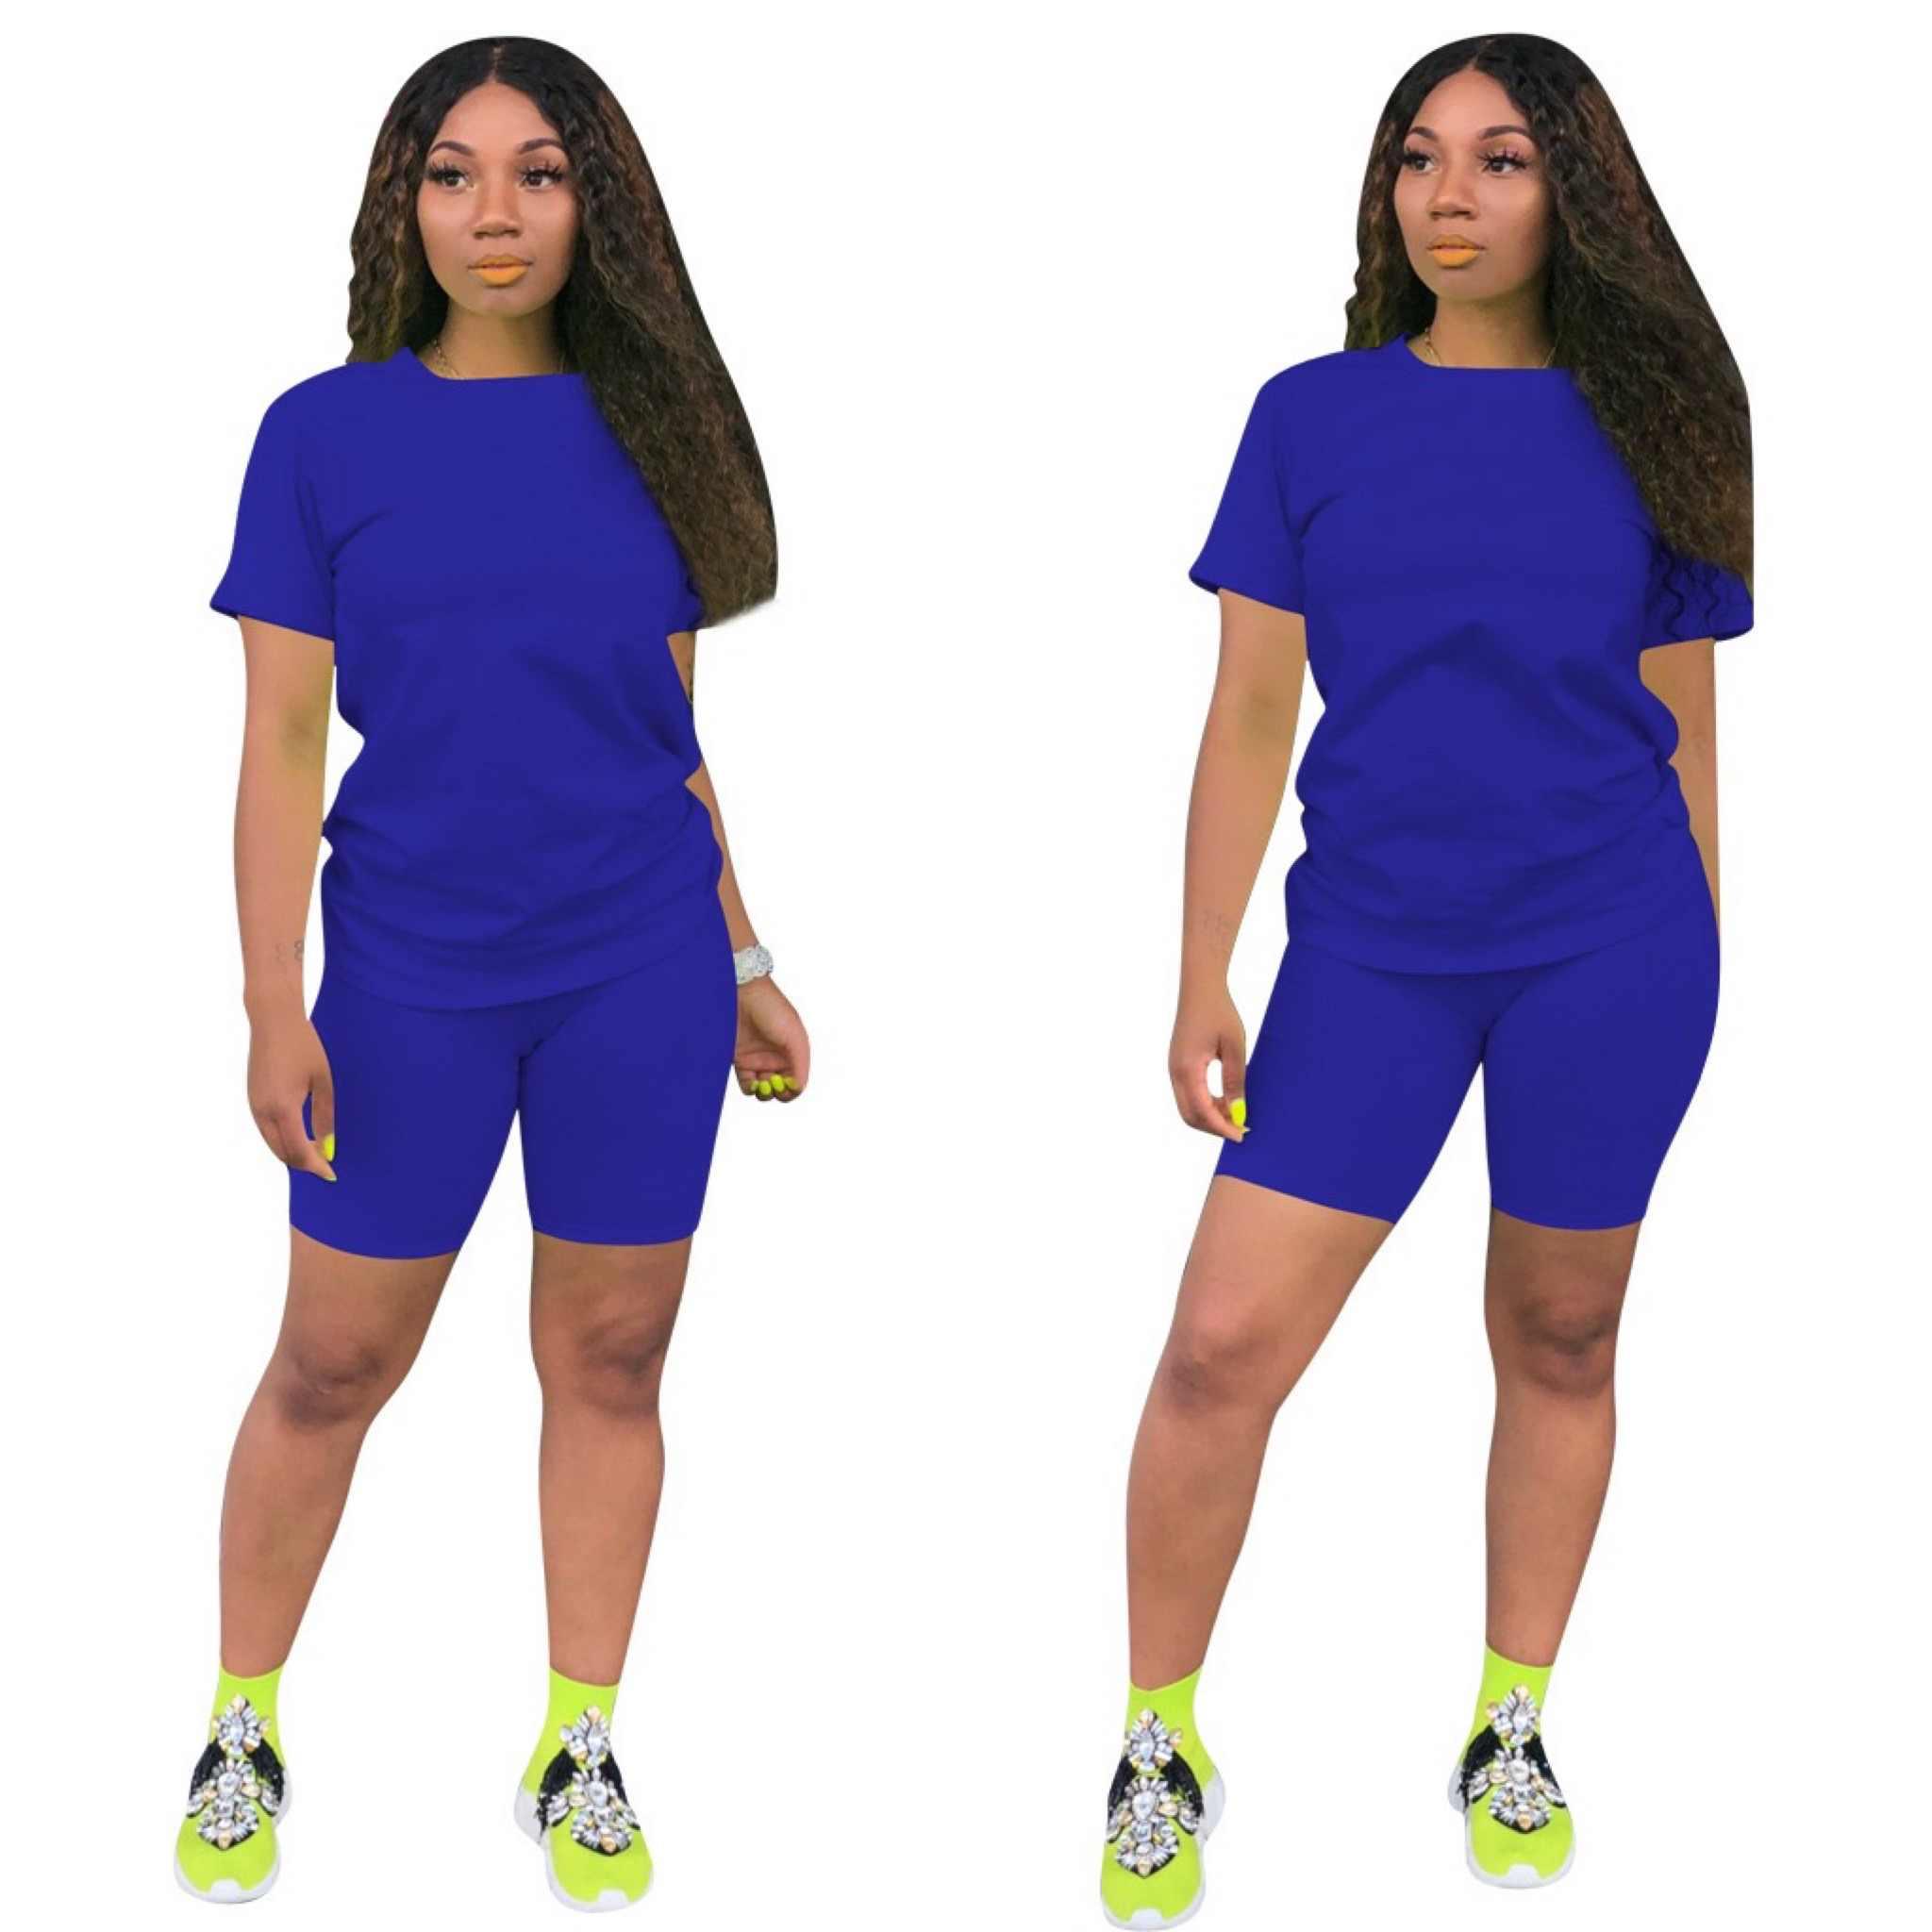 Vrouwen Tweedelige Biker Shorts Sets T-shirts Top + Biker Shorts Jogger 2 Delige Set Casual Actieve Trainingspak Outfit